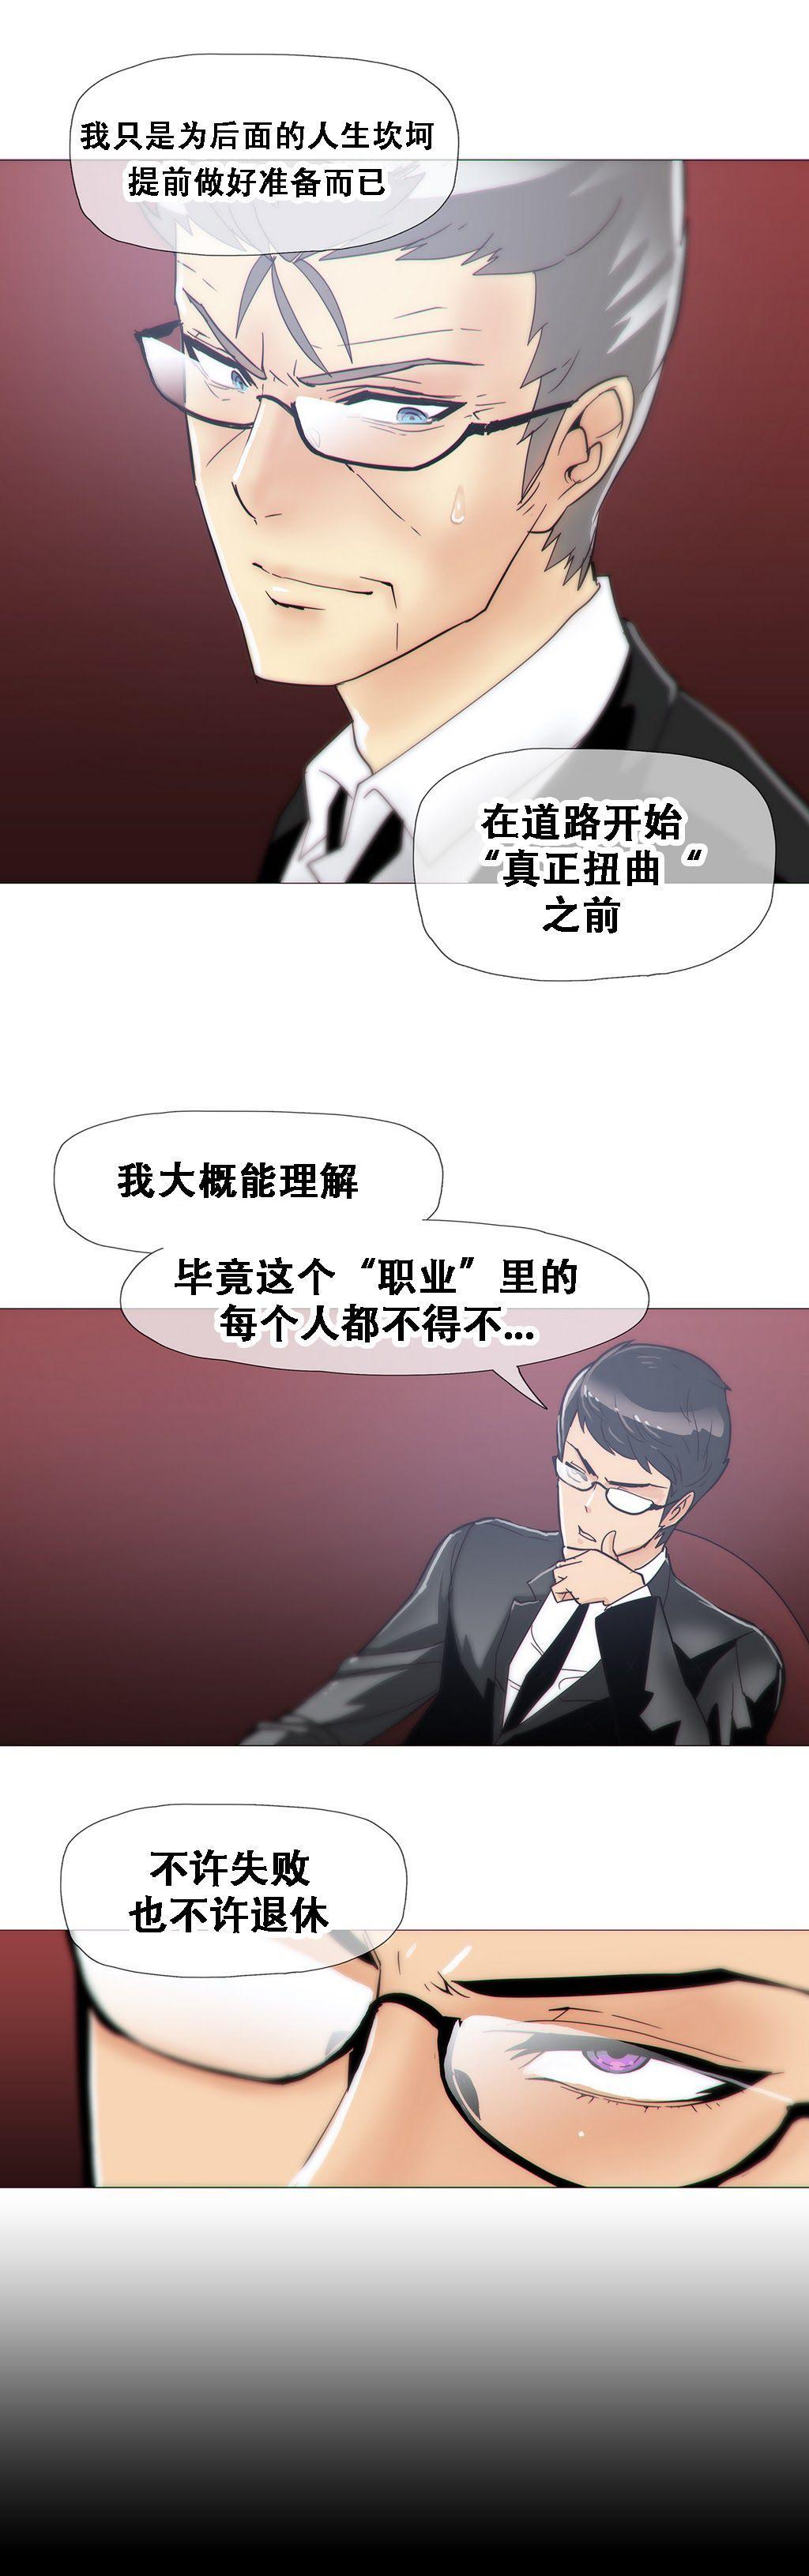 HouseHold Affairs 【卞赤鲤个人汉化】1~33话(持续更新中) 346